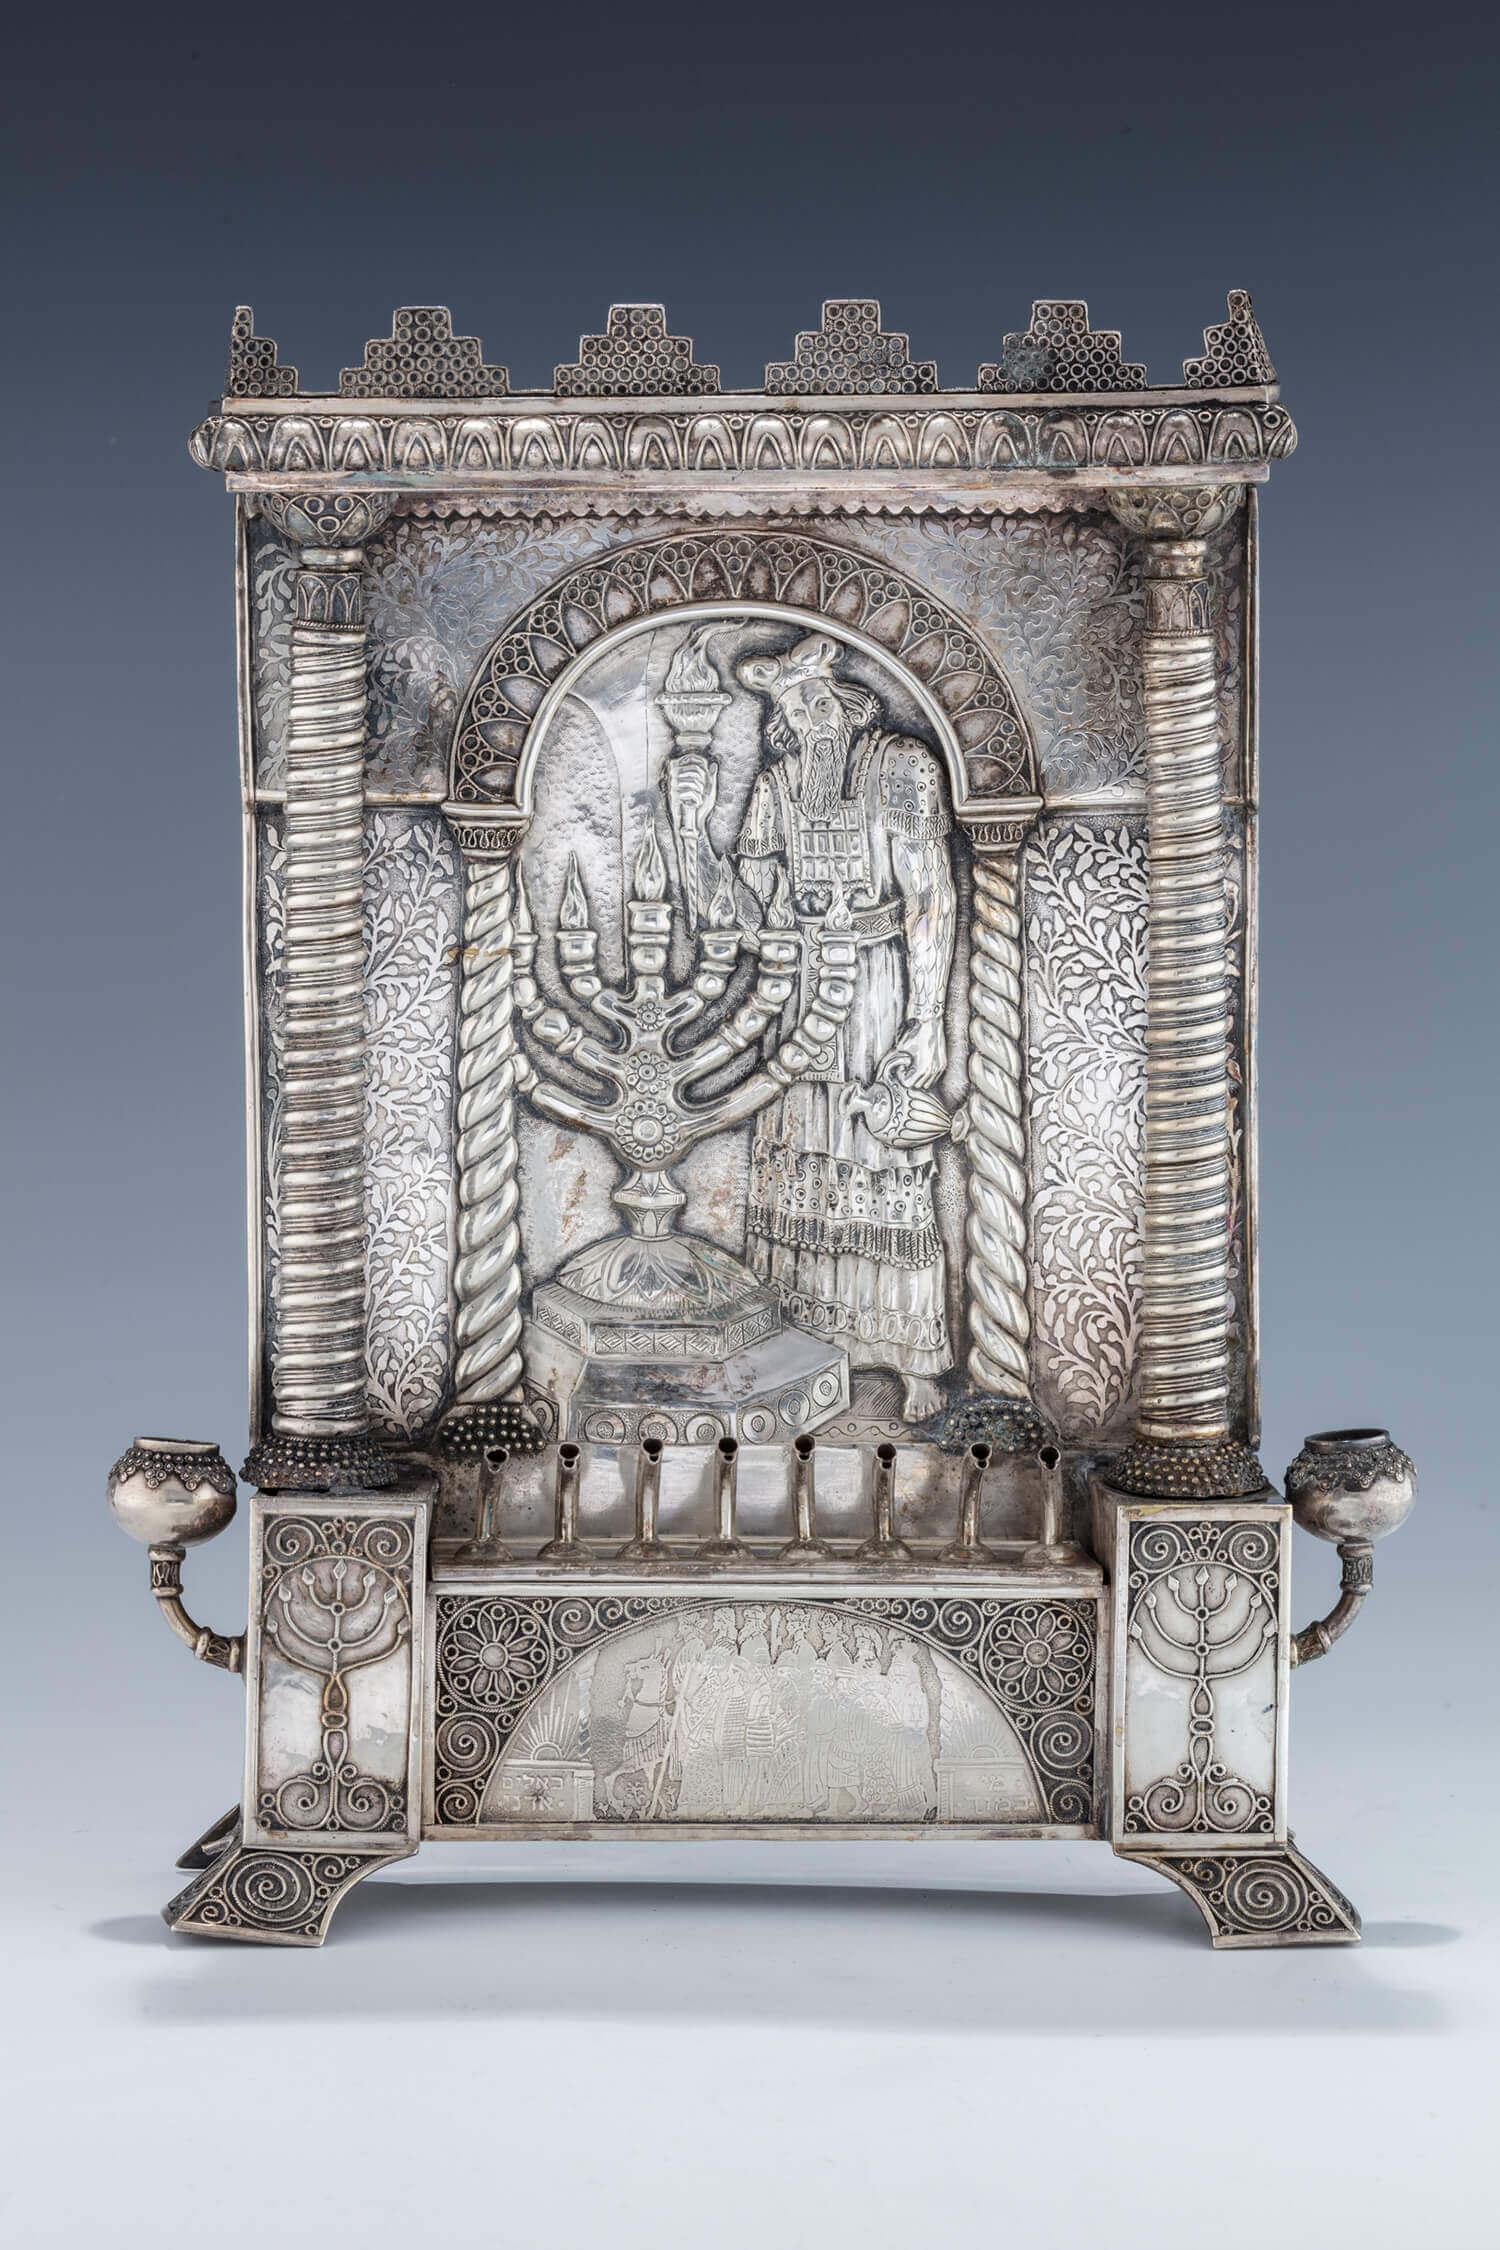 119. AN EXCEPTIONAL SILVER HANUKKAH LAMP BY THE BEZALEL SCHOOL